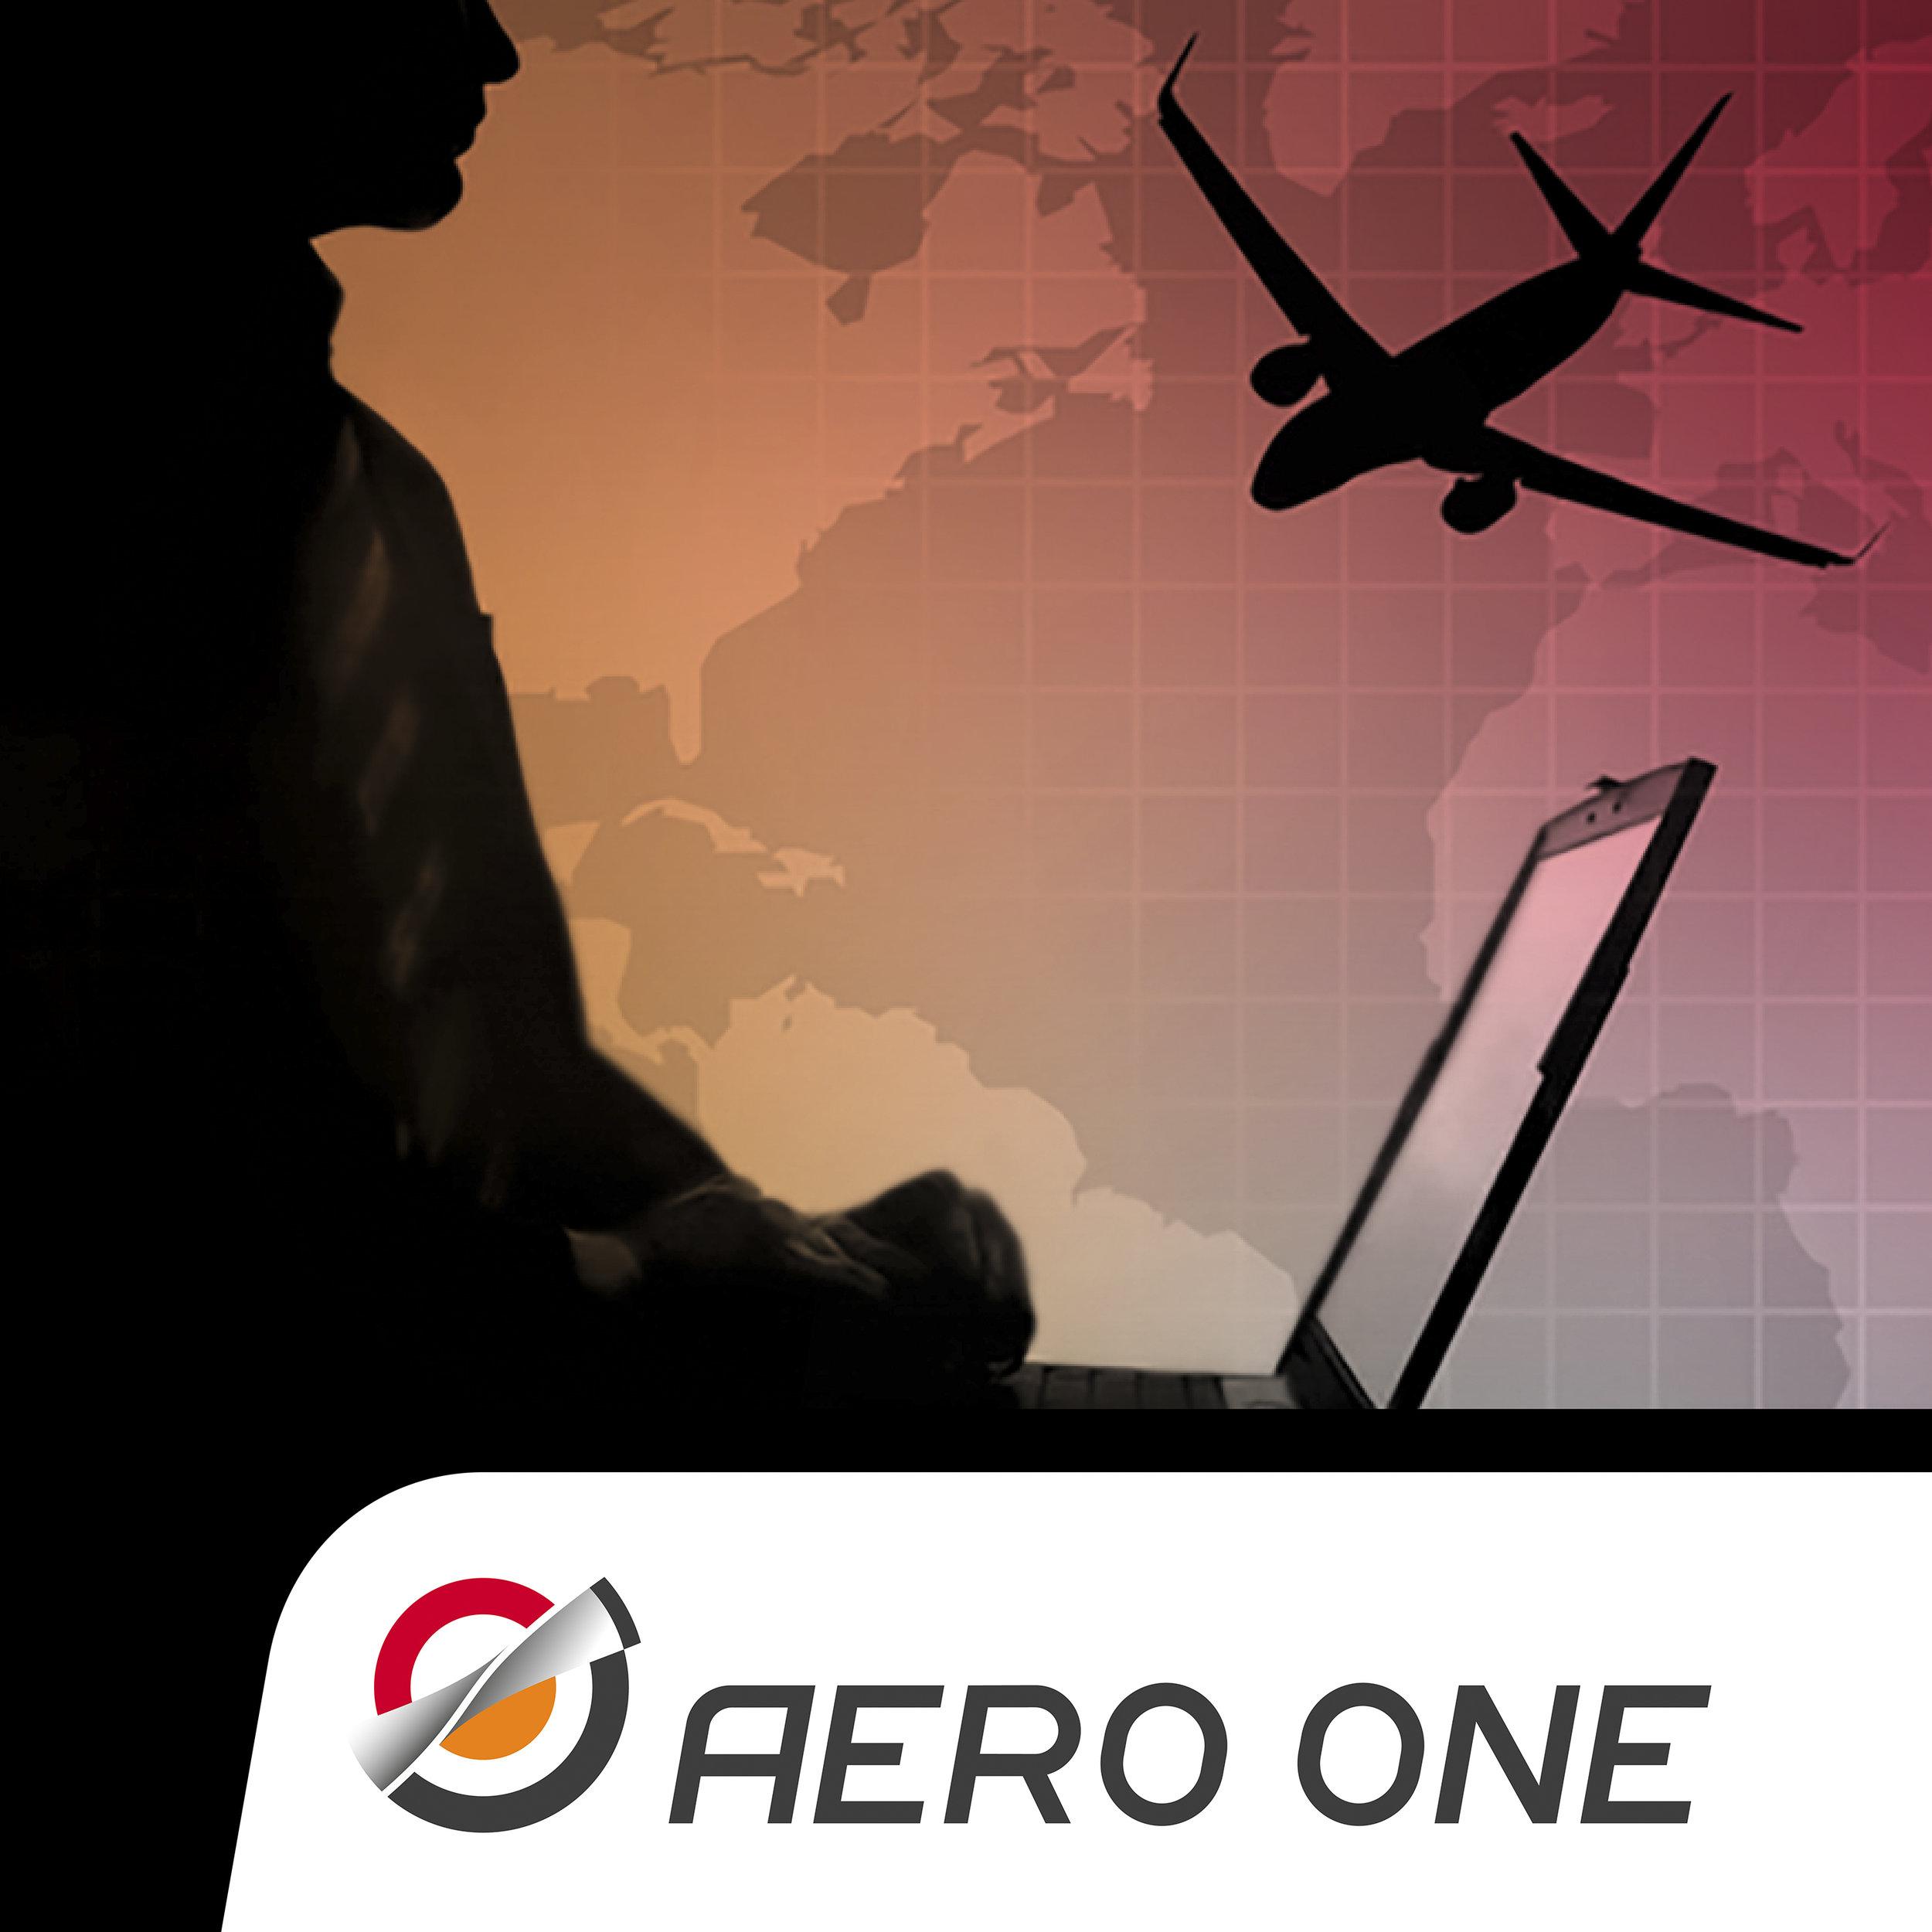 Aero-One-sap-business-one-module-maintenance-aviation.jpg